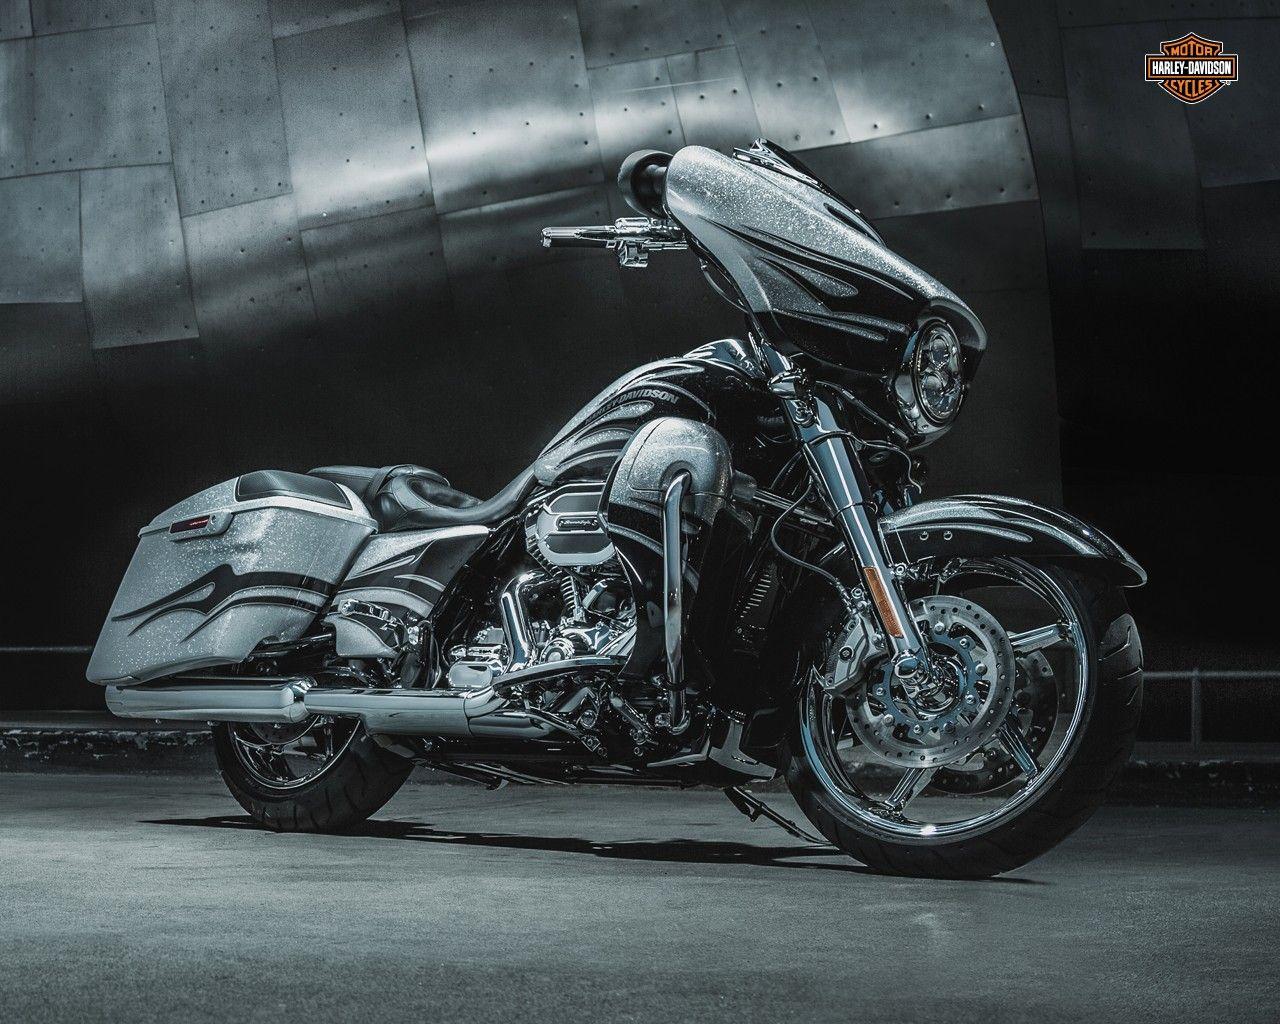 2015 H D Cvo Street Glide Harley Davidson Harley Davidson History